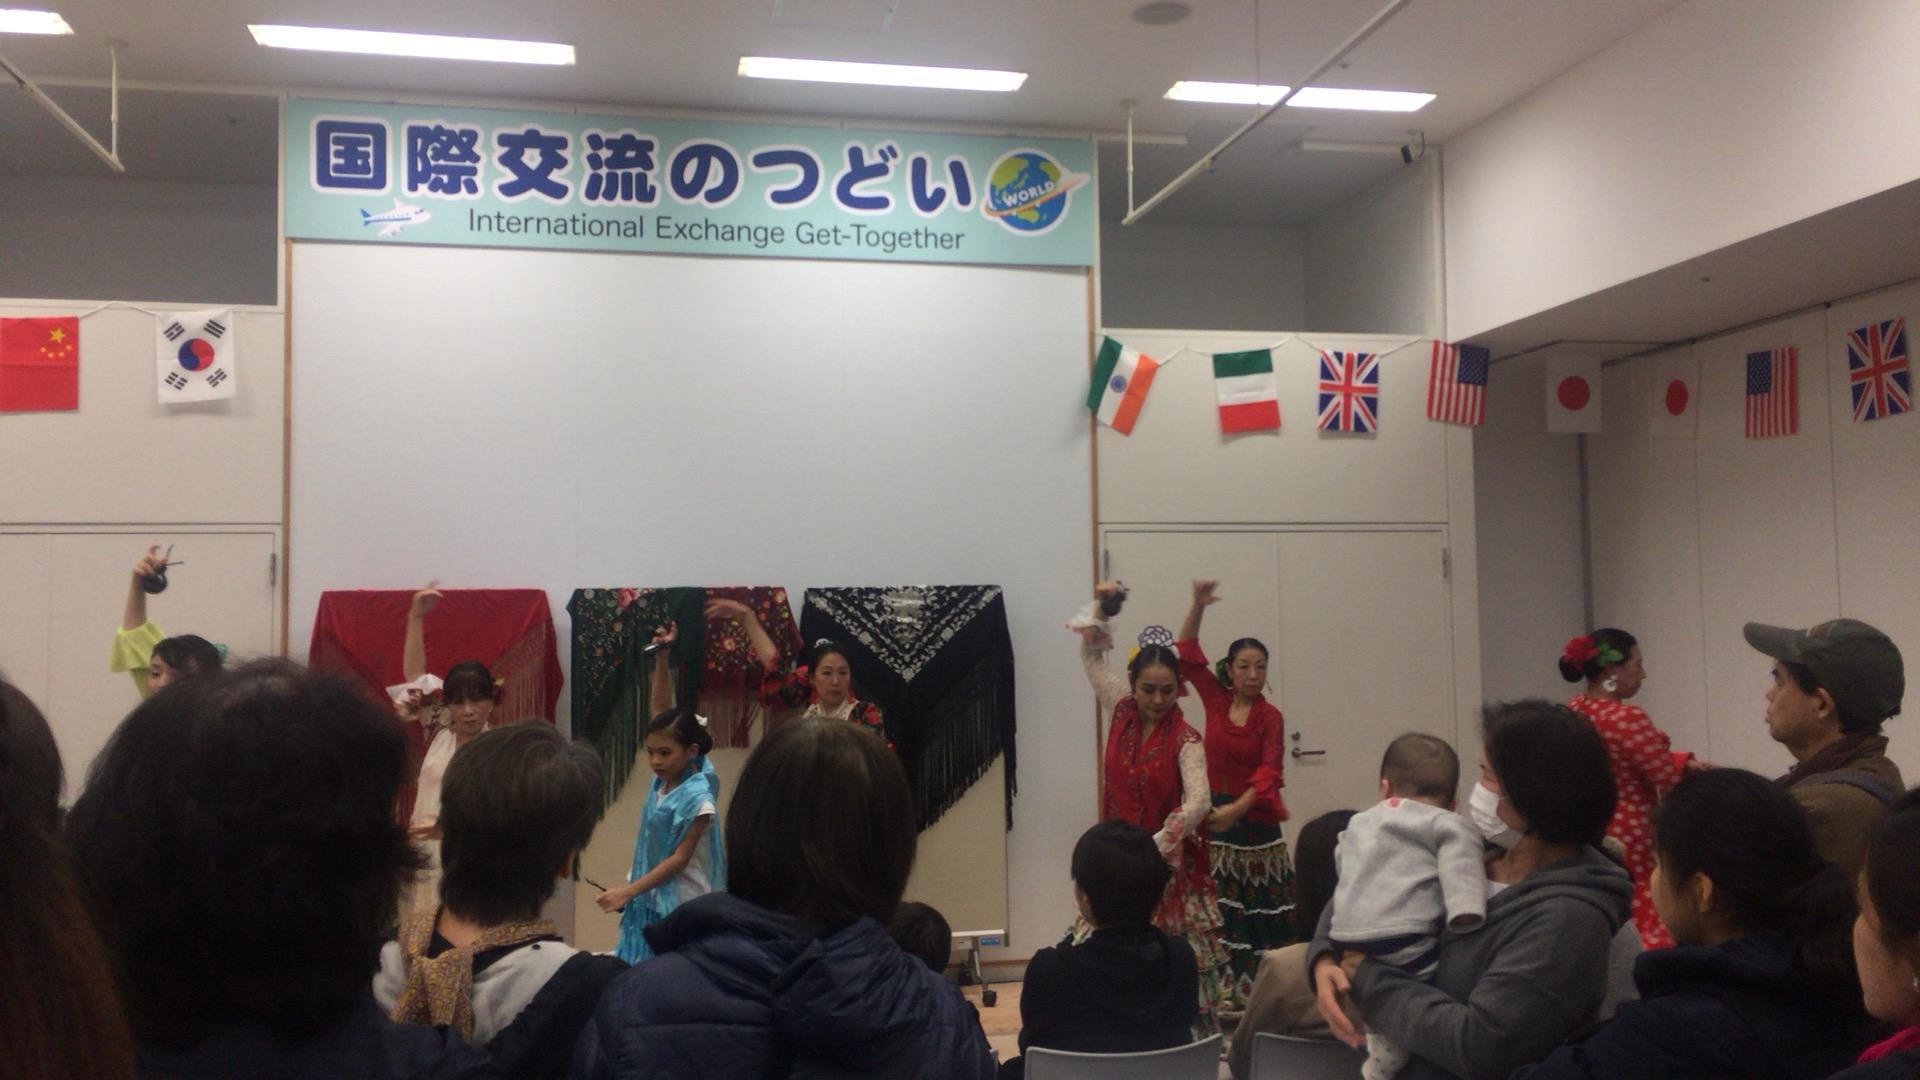 Gathering image of international exchange